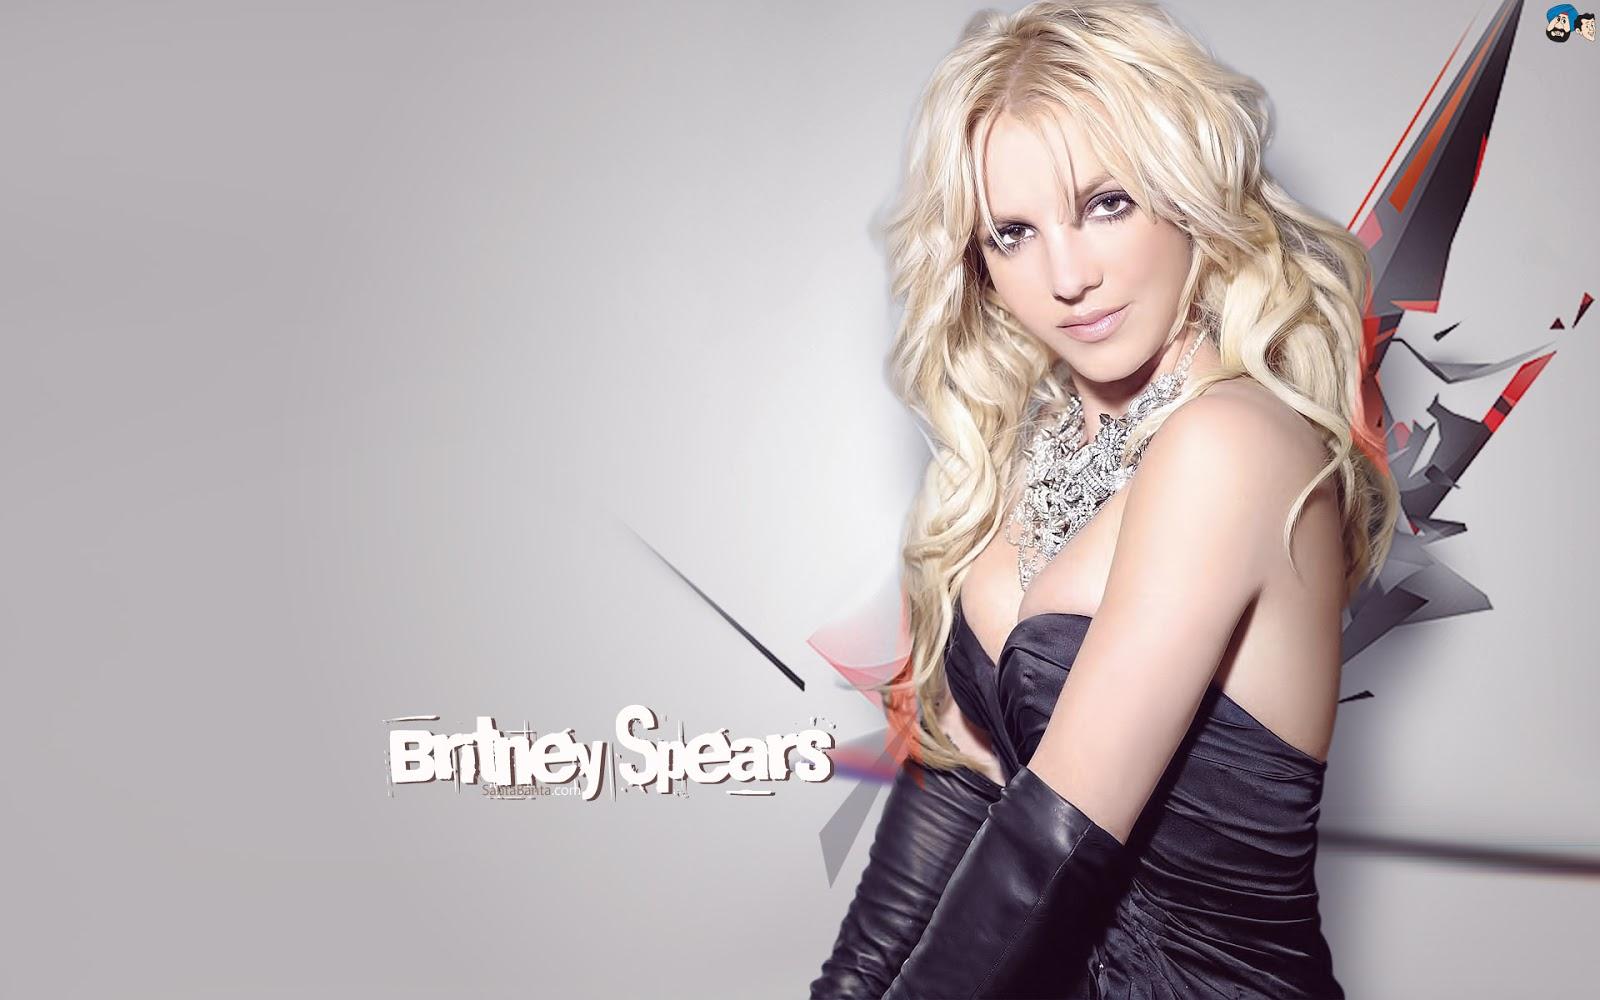 Britney Spears Pop Music Wallpaper Resolution 1600x1000 Id 880540 Wallha Com